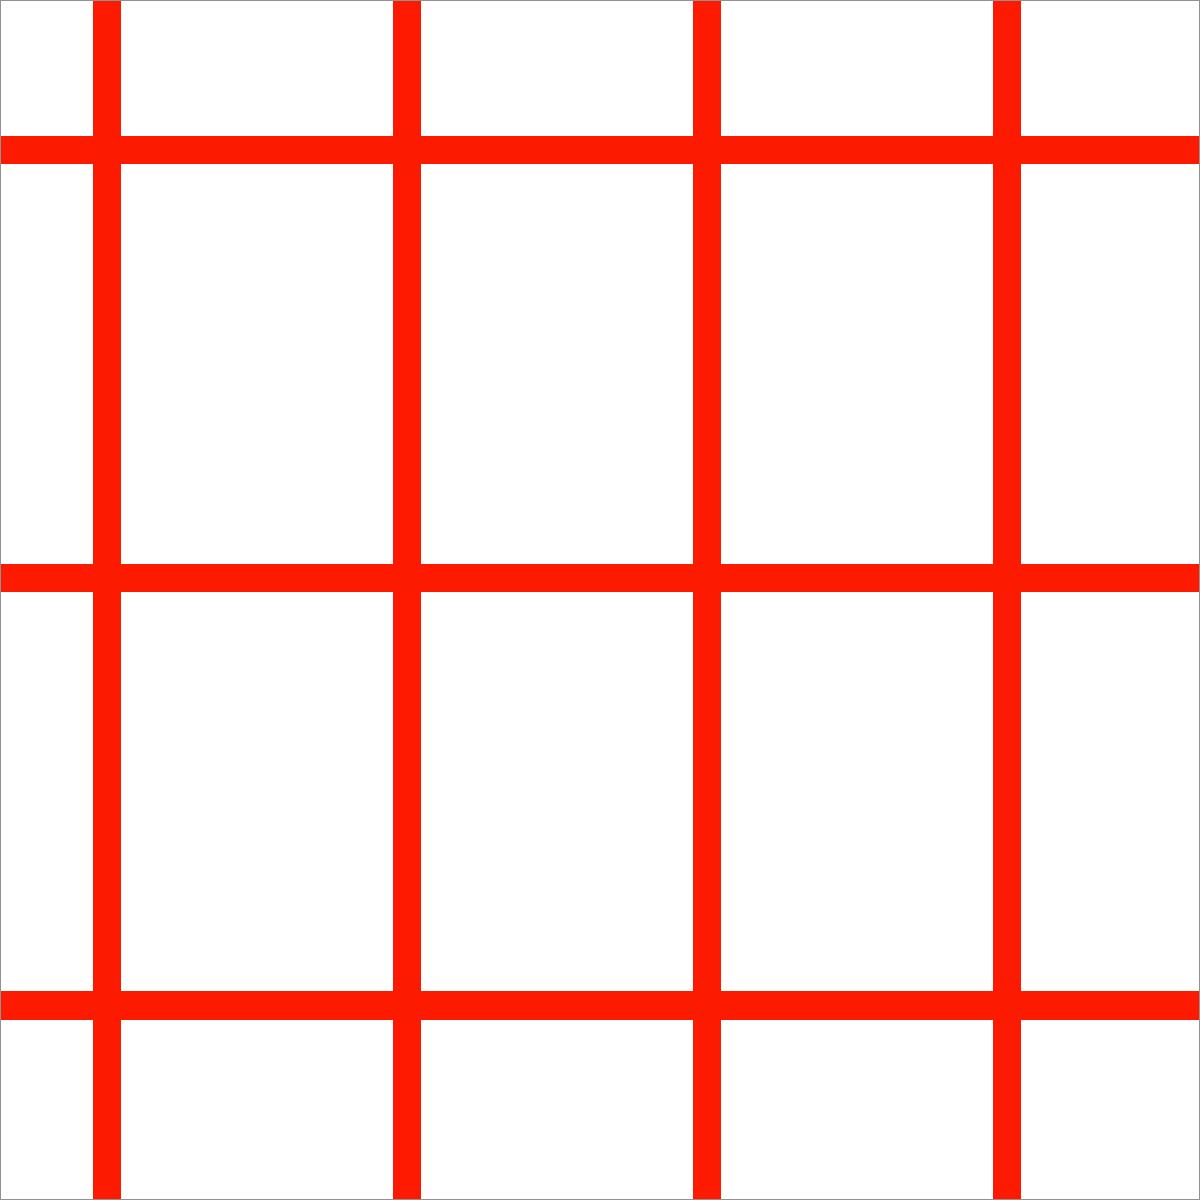 Fabric_Red_DigSample.jpg